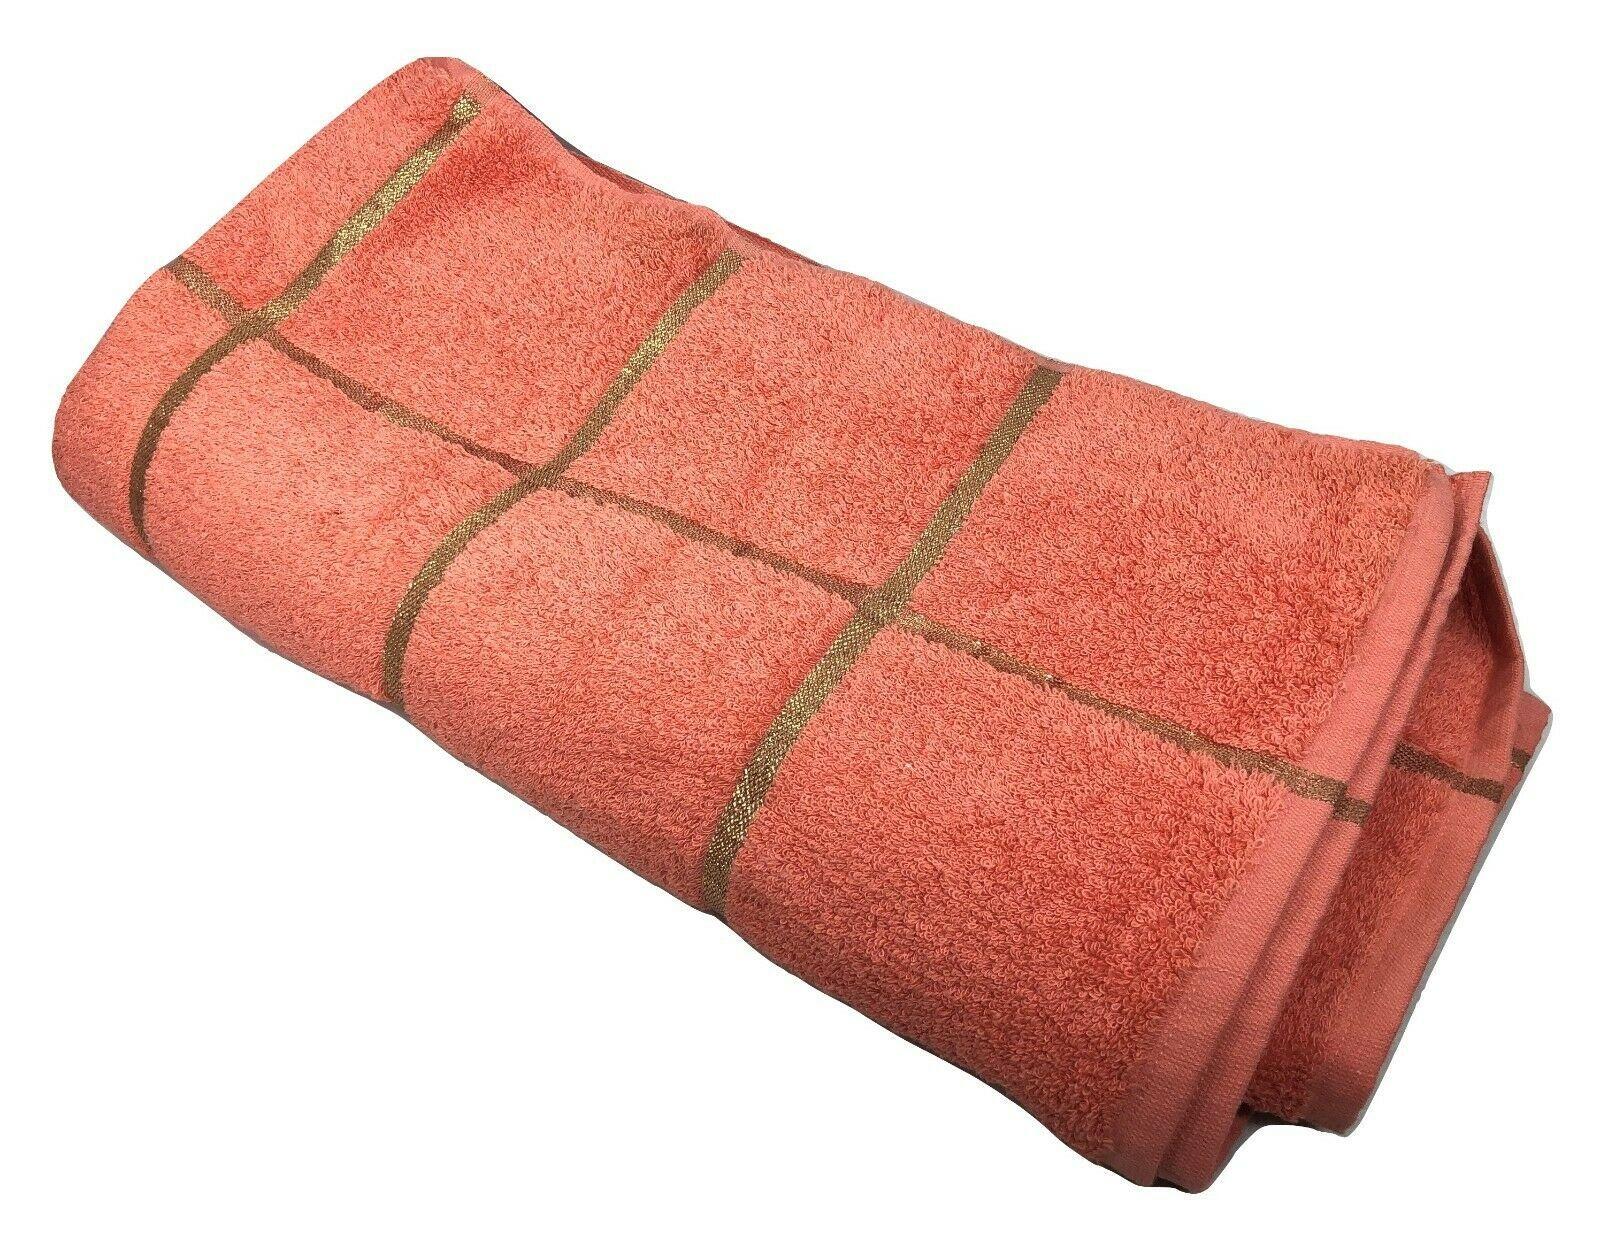 "Martex Bath Towel 72""x36"" Salmon Color with Gold Highlights Vintage Retro NEW - $64.35"